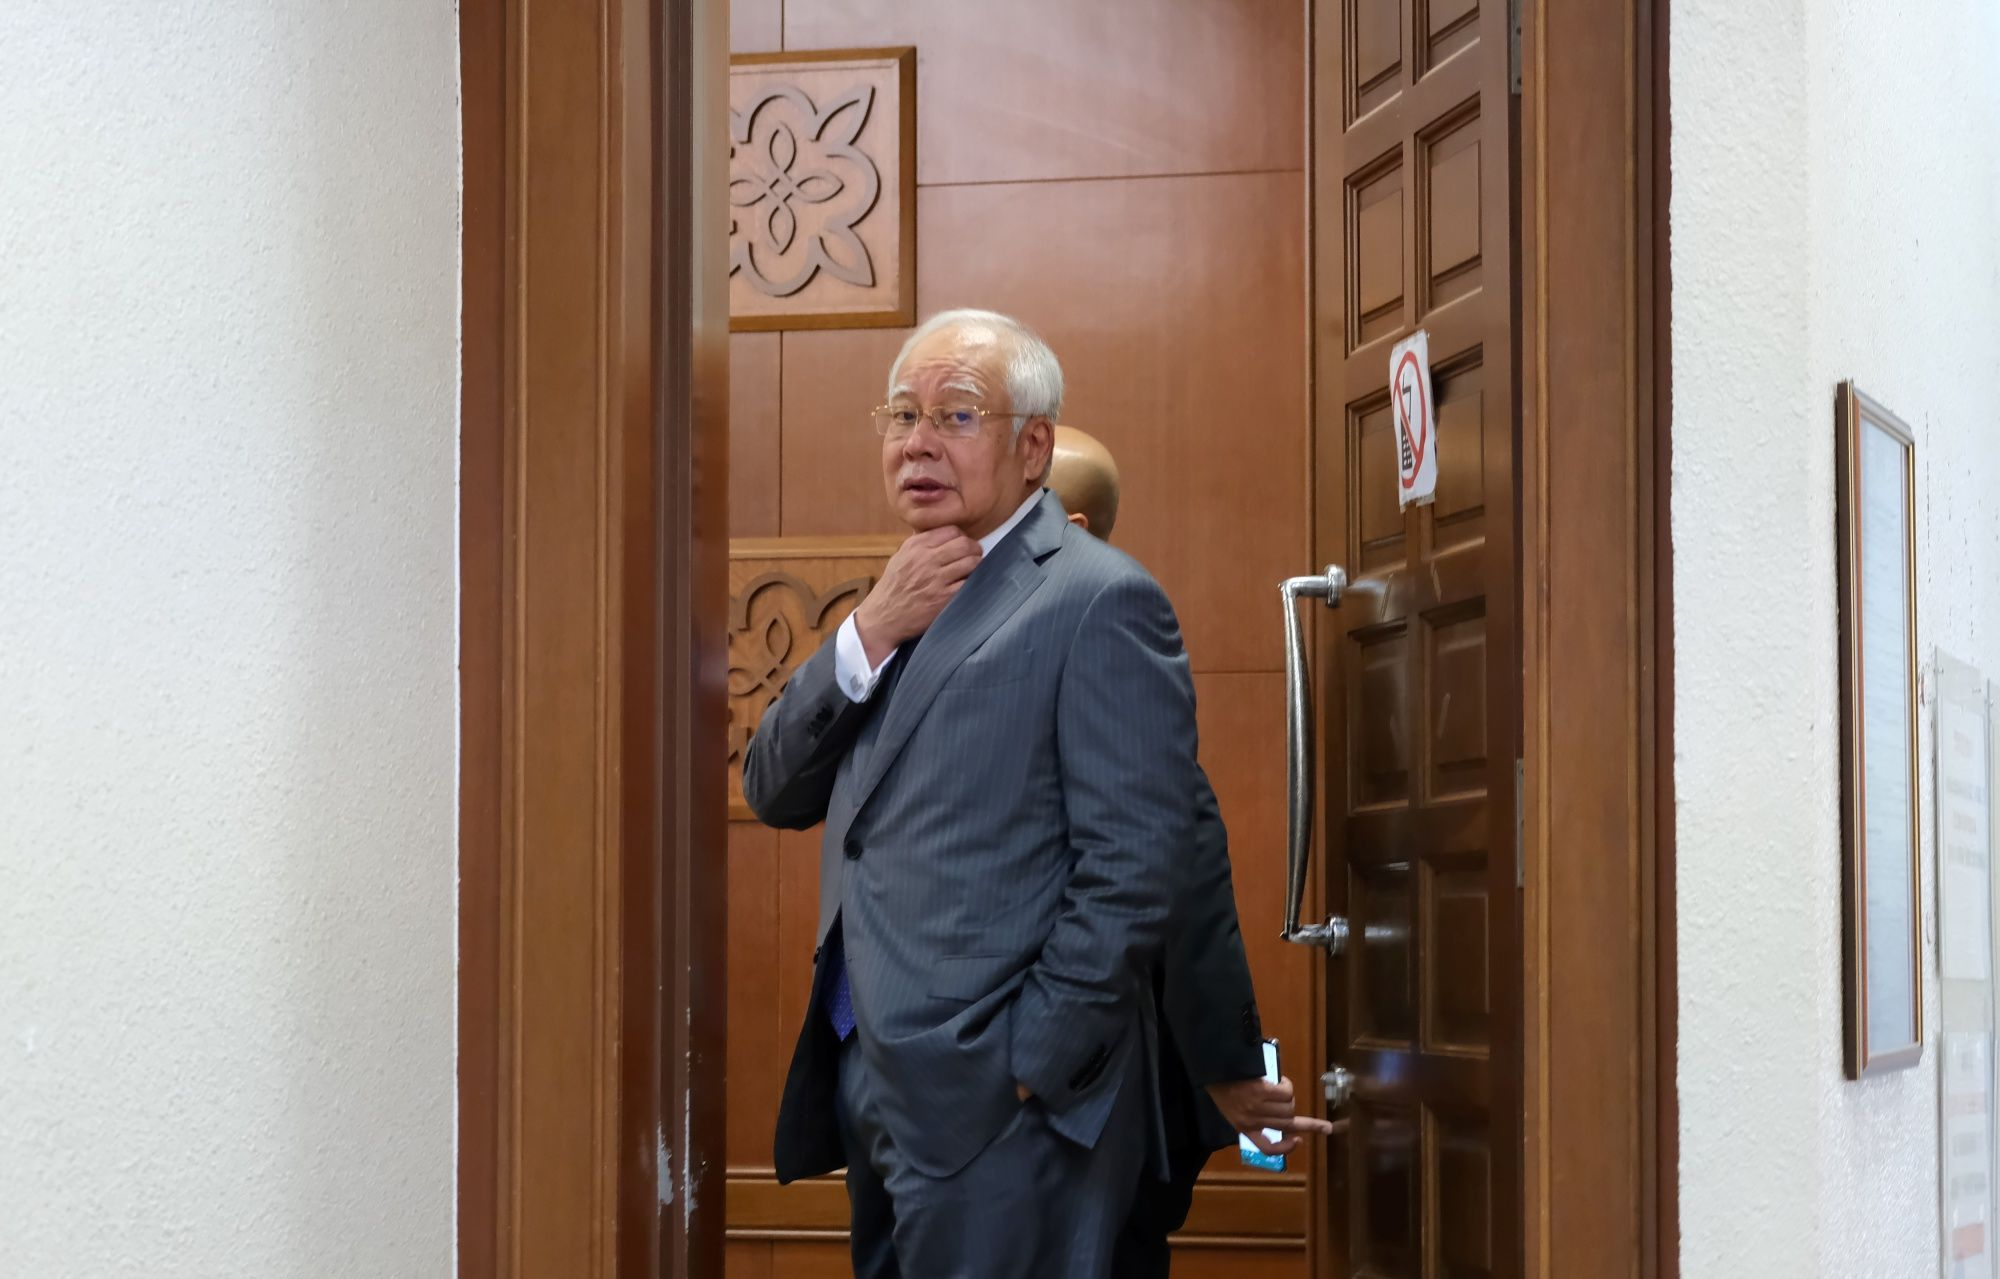 Recordings Show Najib's Effort to Seek Help on 1MDB Scandal